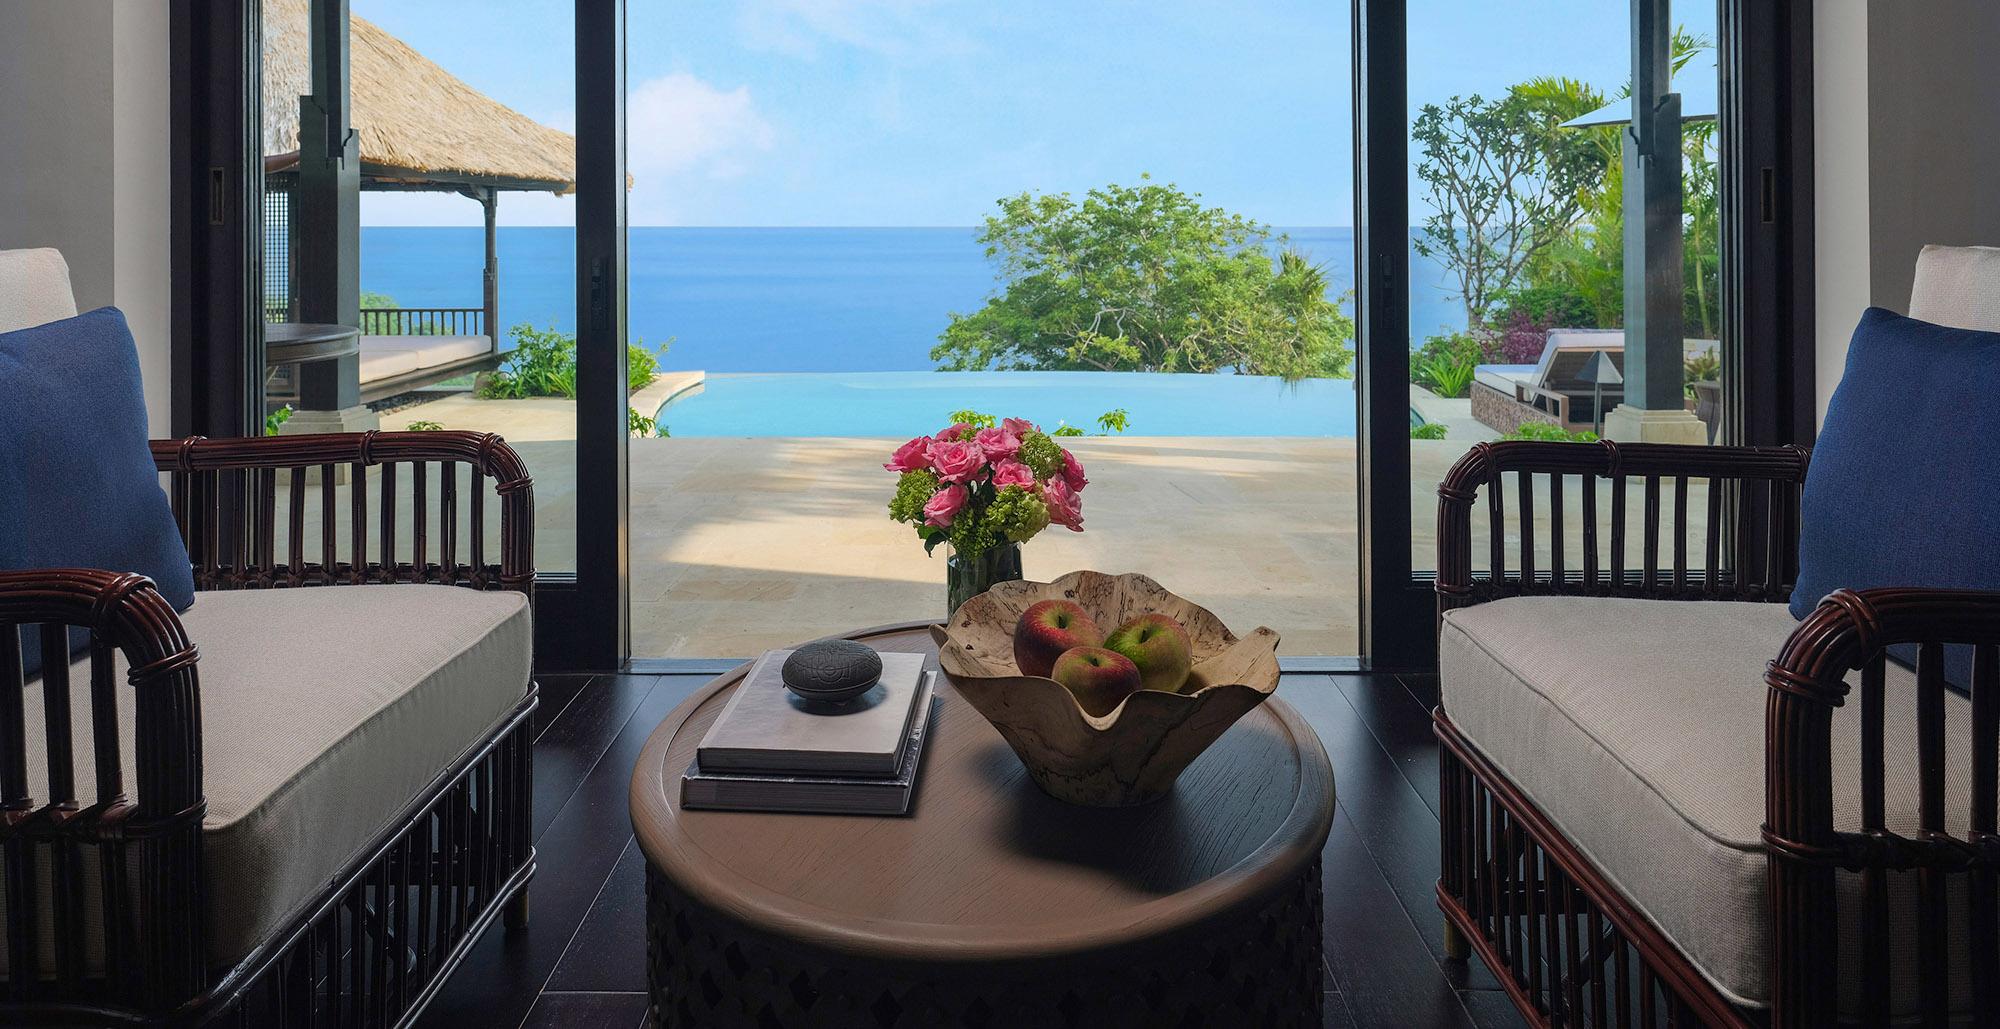 Ocean Pool Villa 9 (Dewandra Djelantik - Accor)